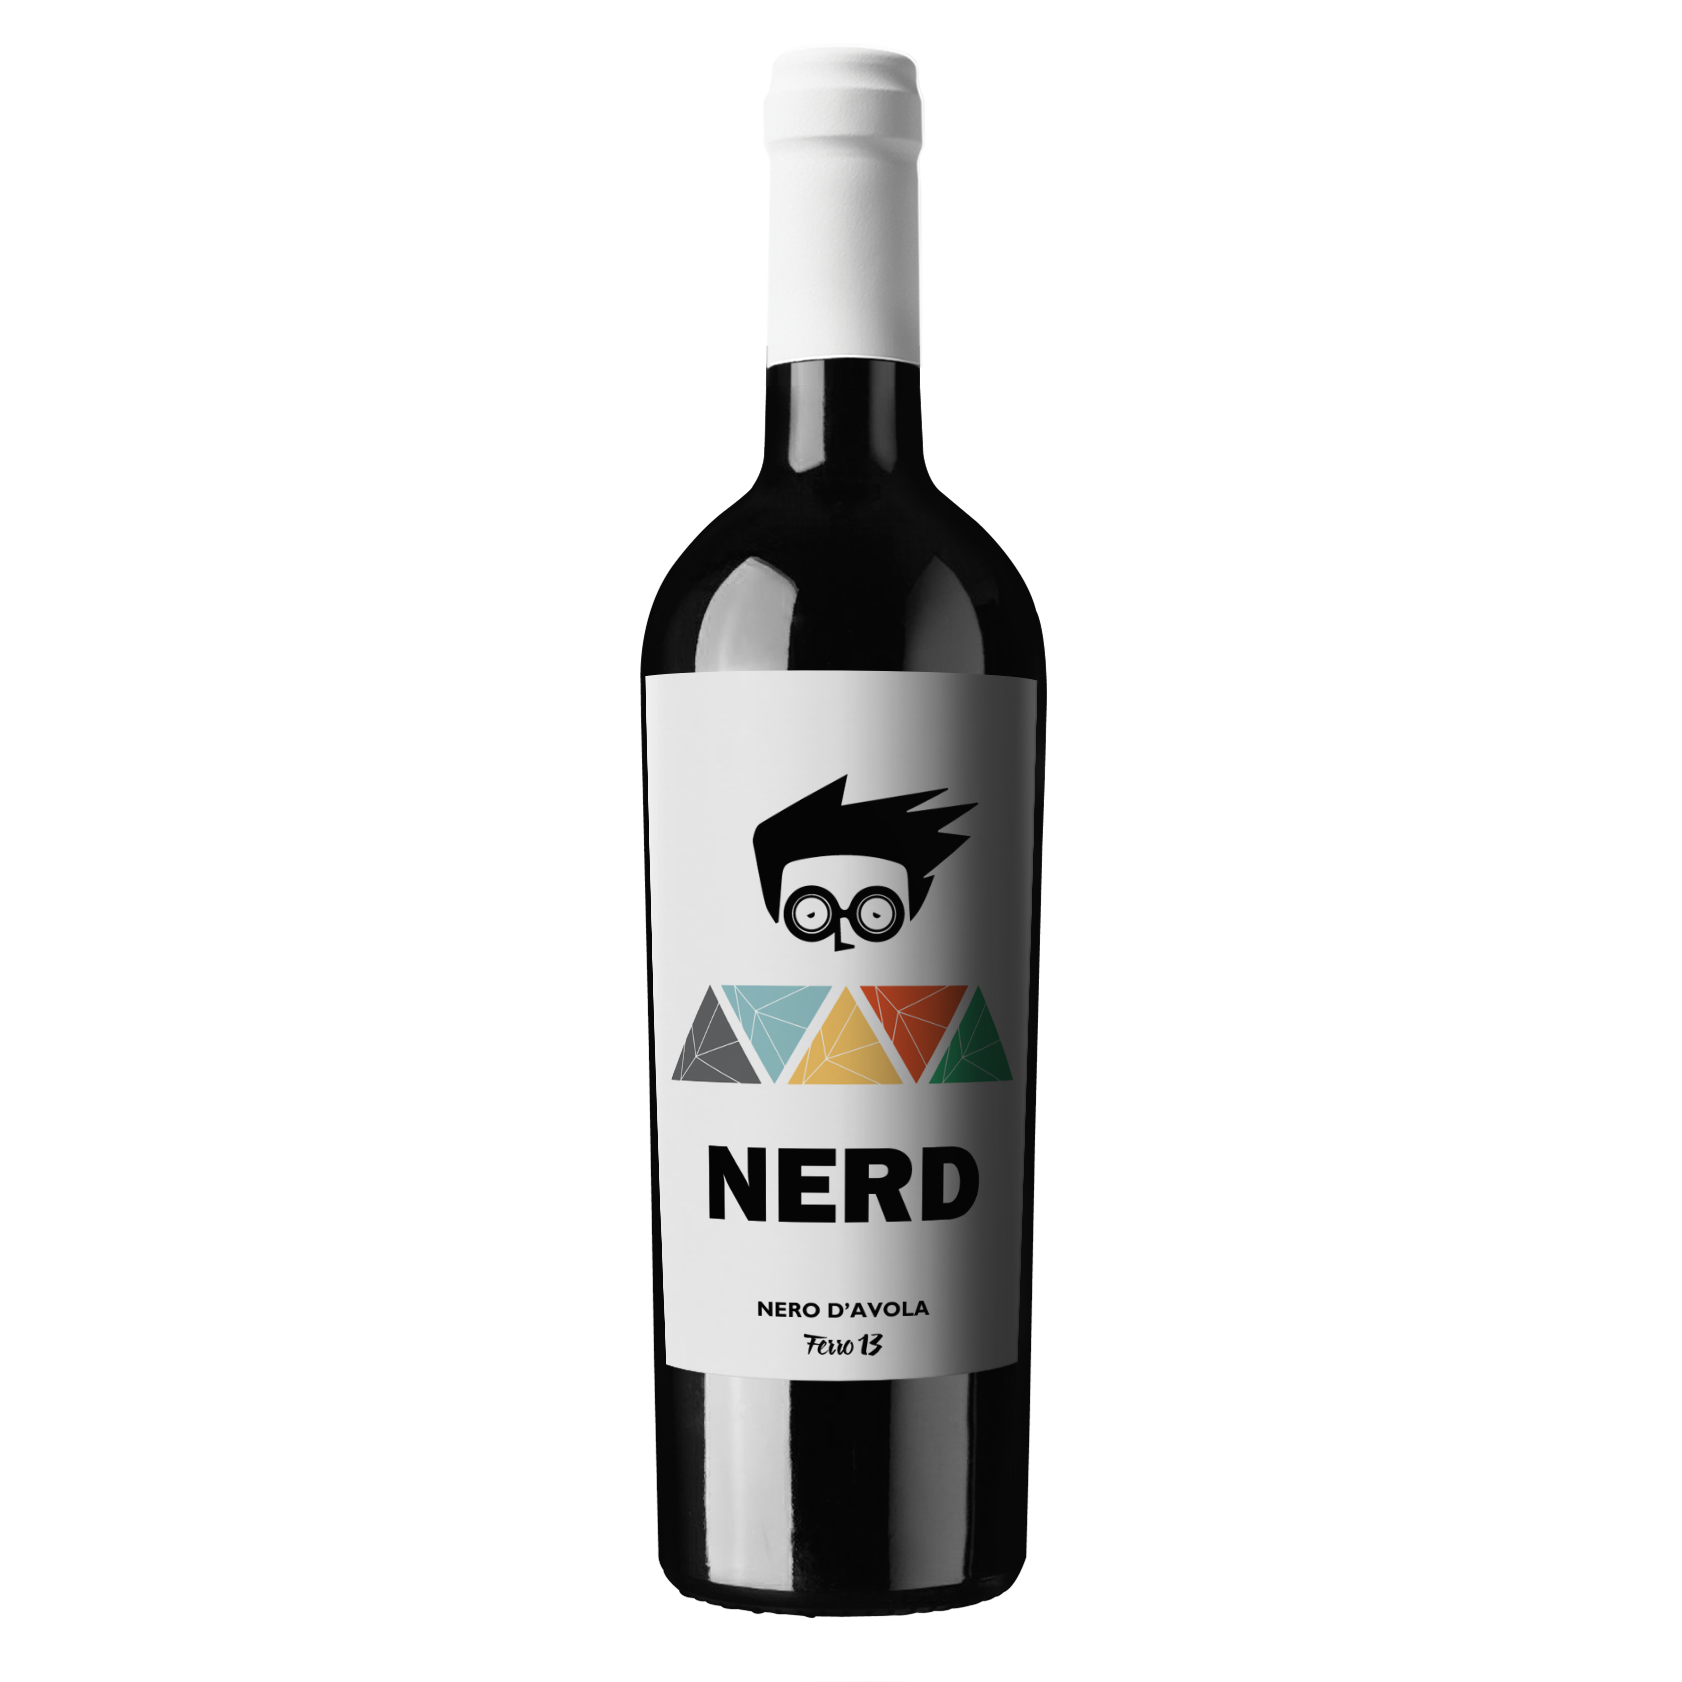 Vino Nerd Nero D'Avola Sicilia DOC CL.75